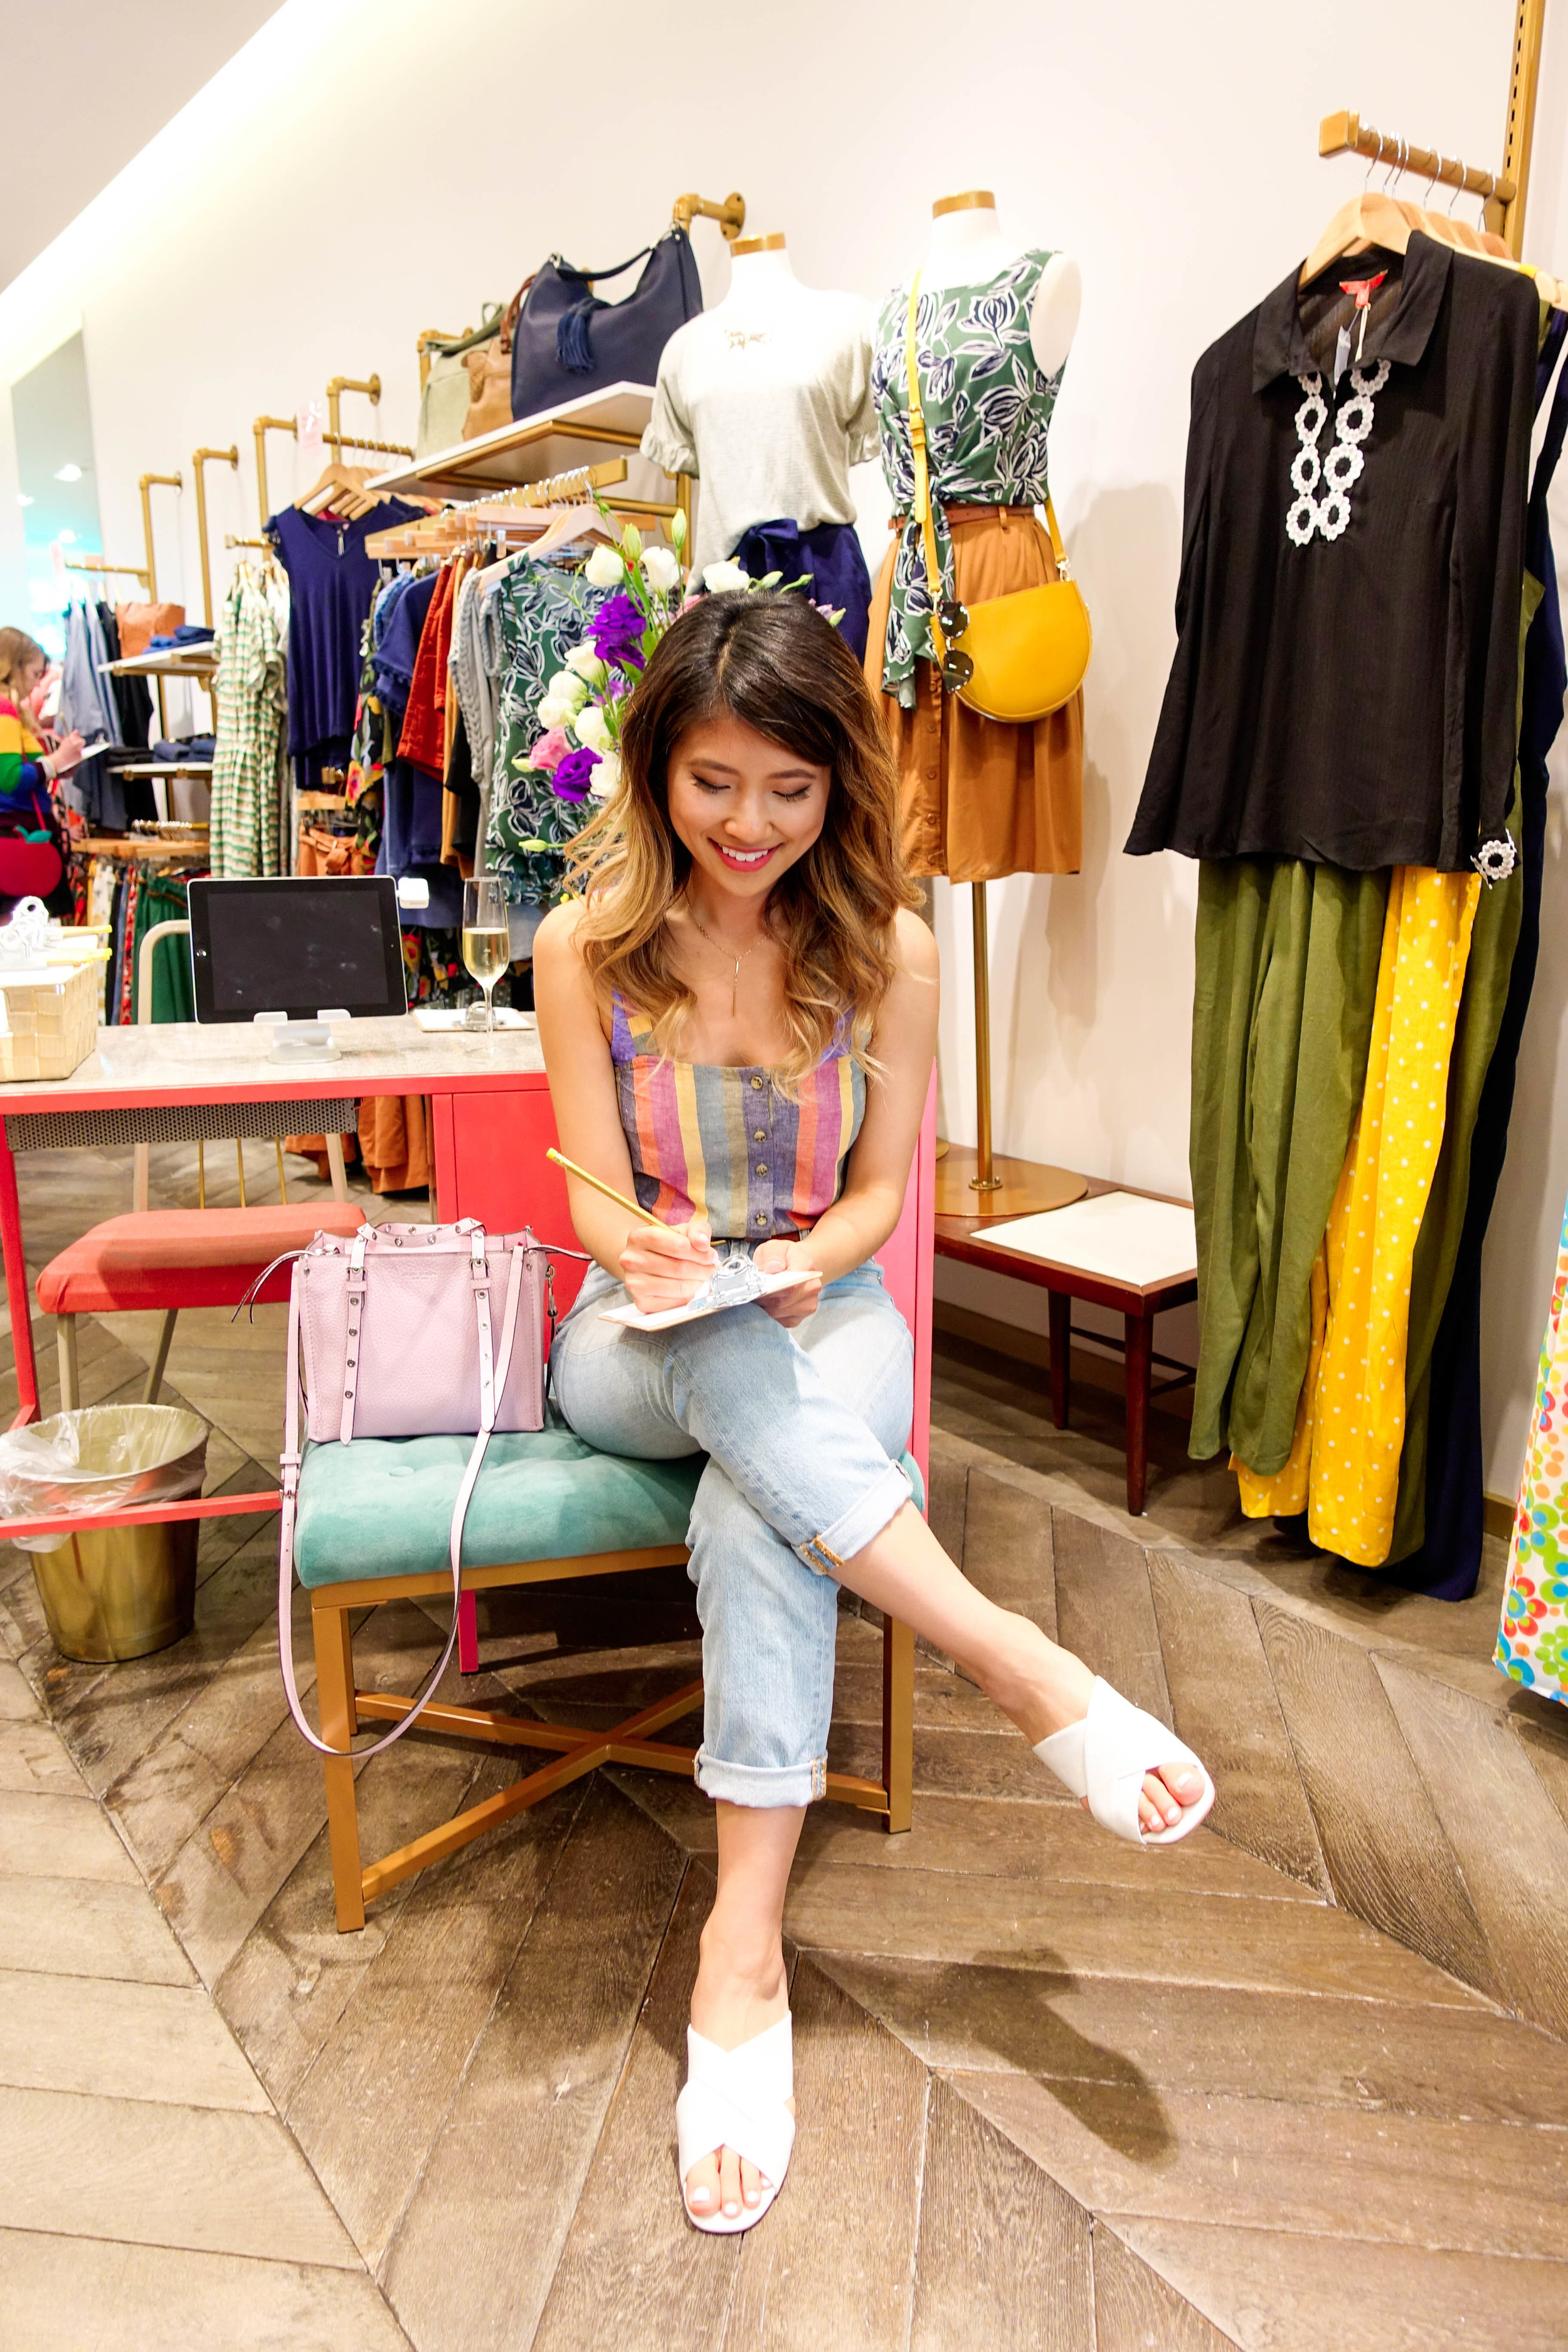 FashionbyAlly-ModCloth-SanFrancisco-Blog6.JPG